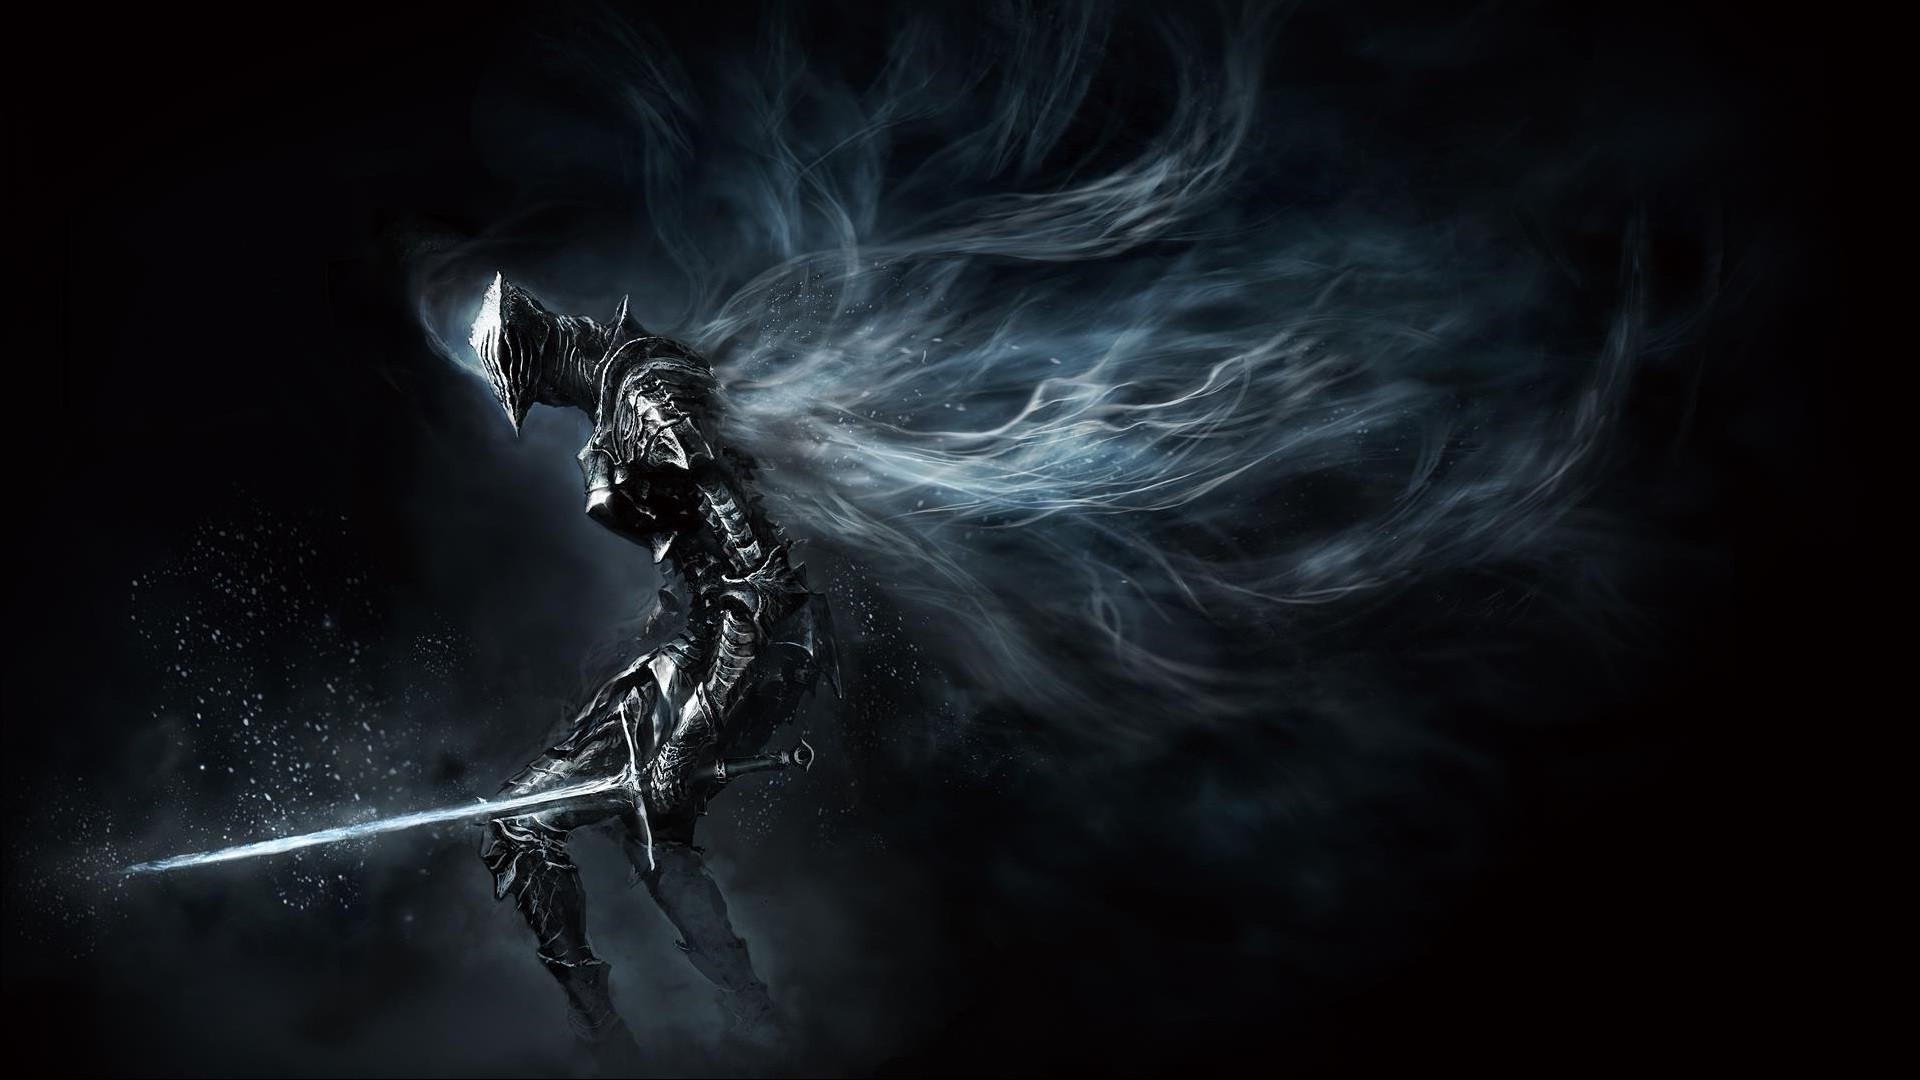 1920x1080 Px Armor Artwork Concept Art Dark Souls III Knight Sword Video Games Warrior